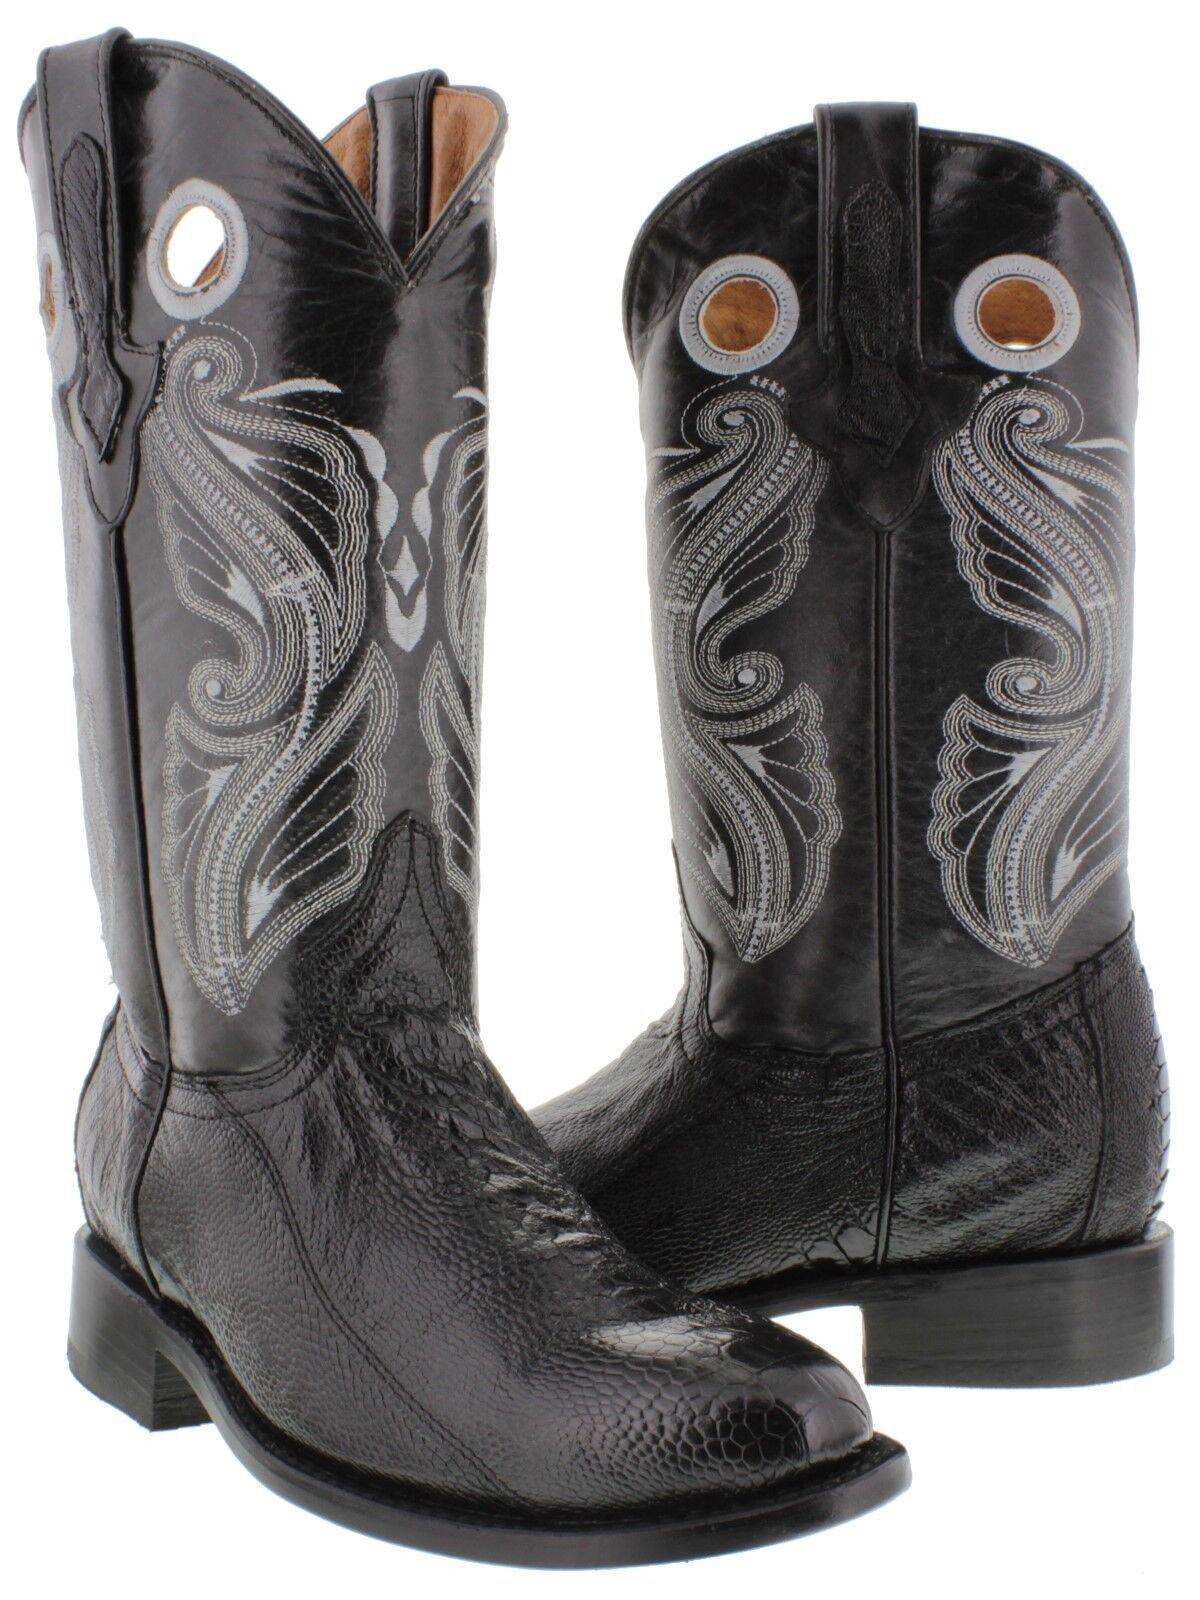 Men's Black Genuine Ostrich Skin Western Rodeo Cowboy Leather Boots Roper Toe